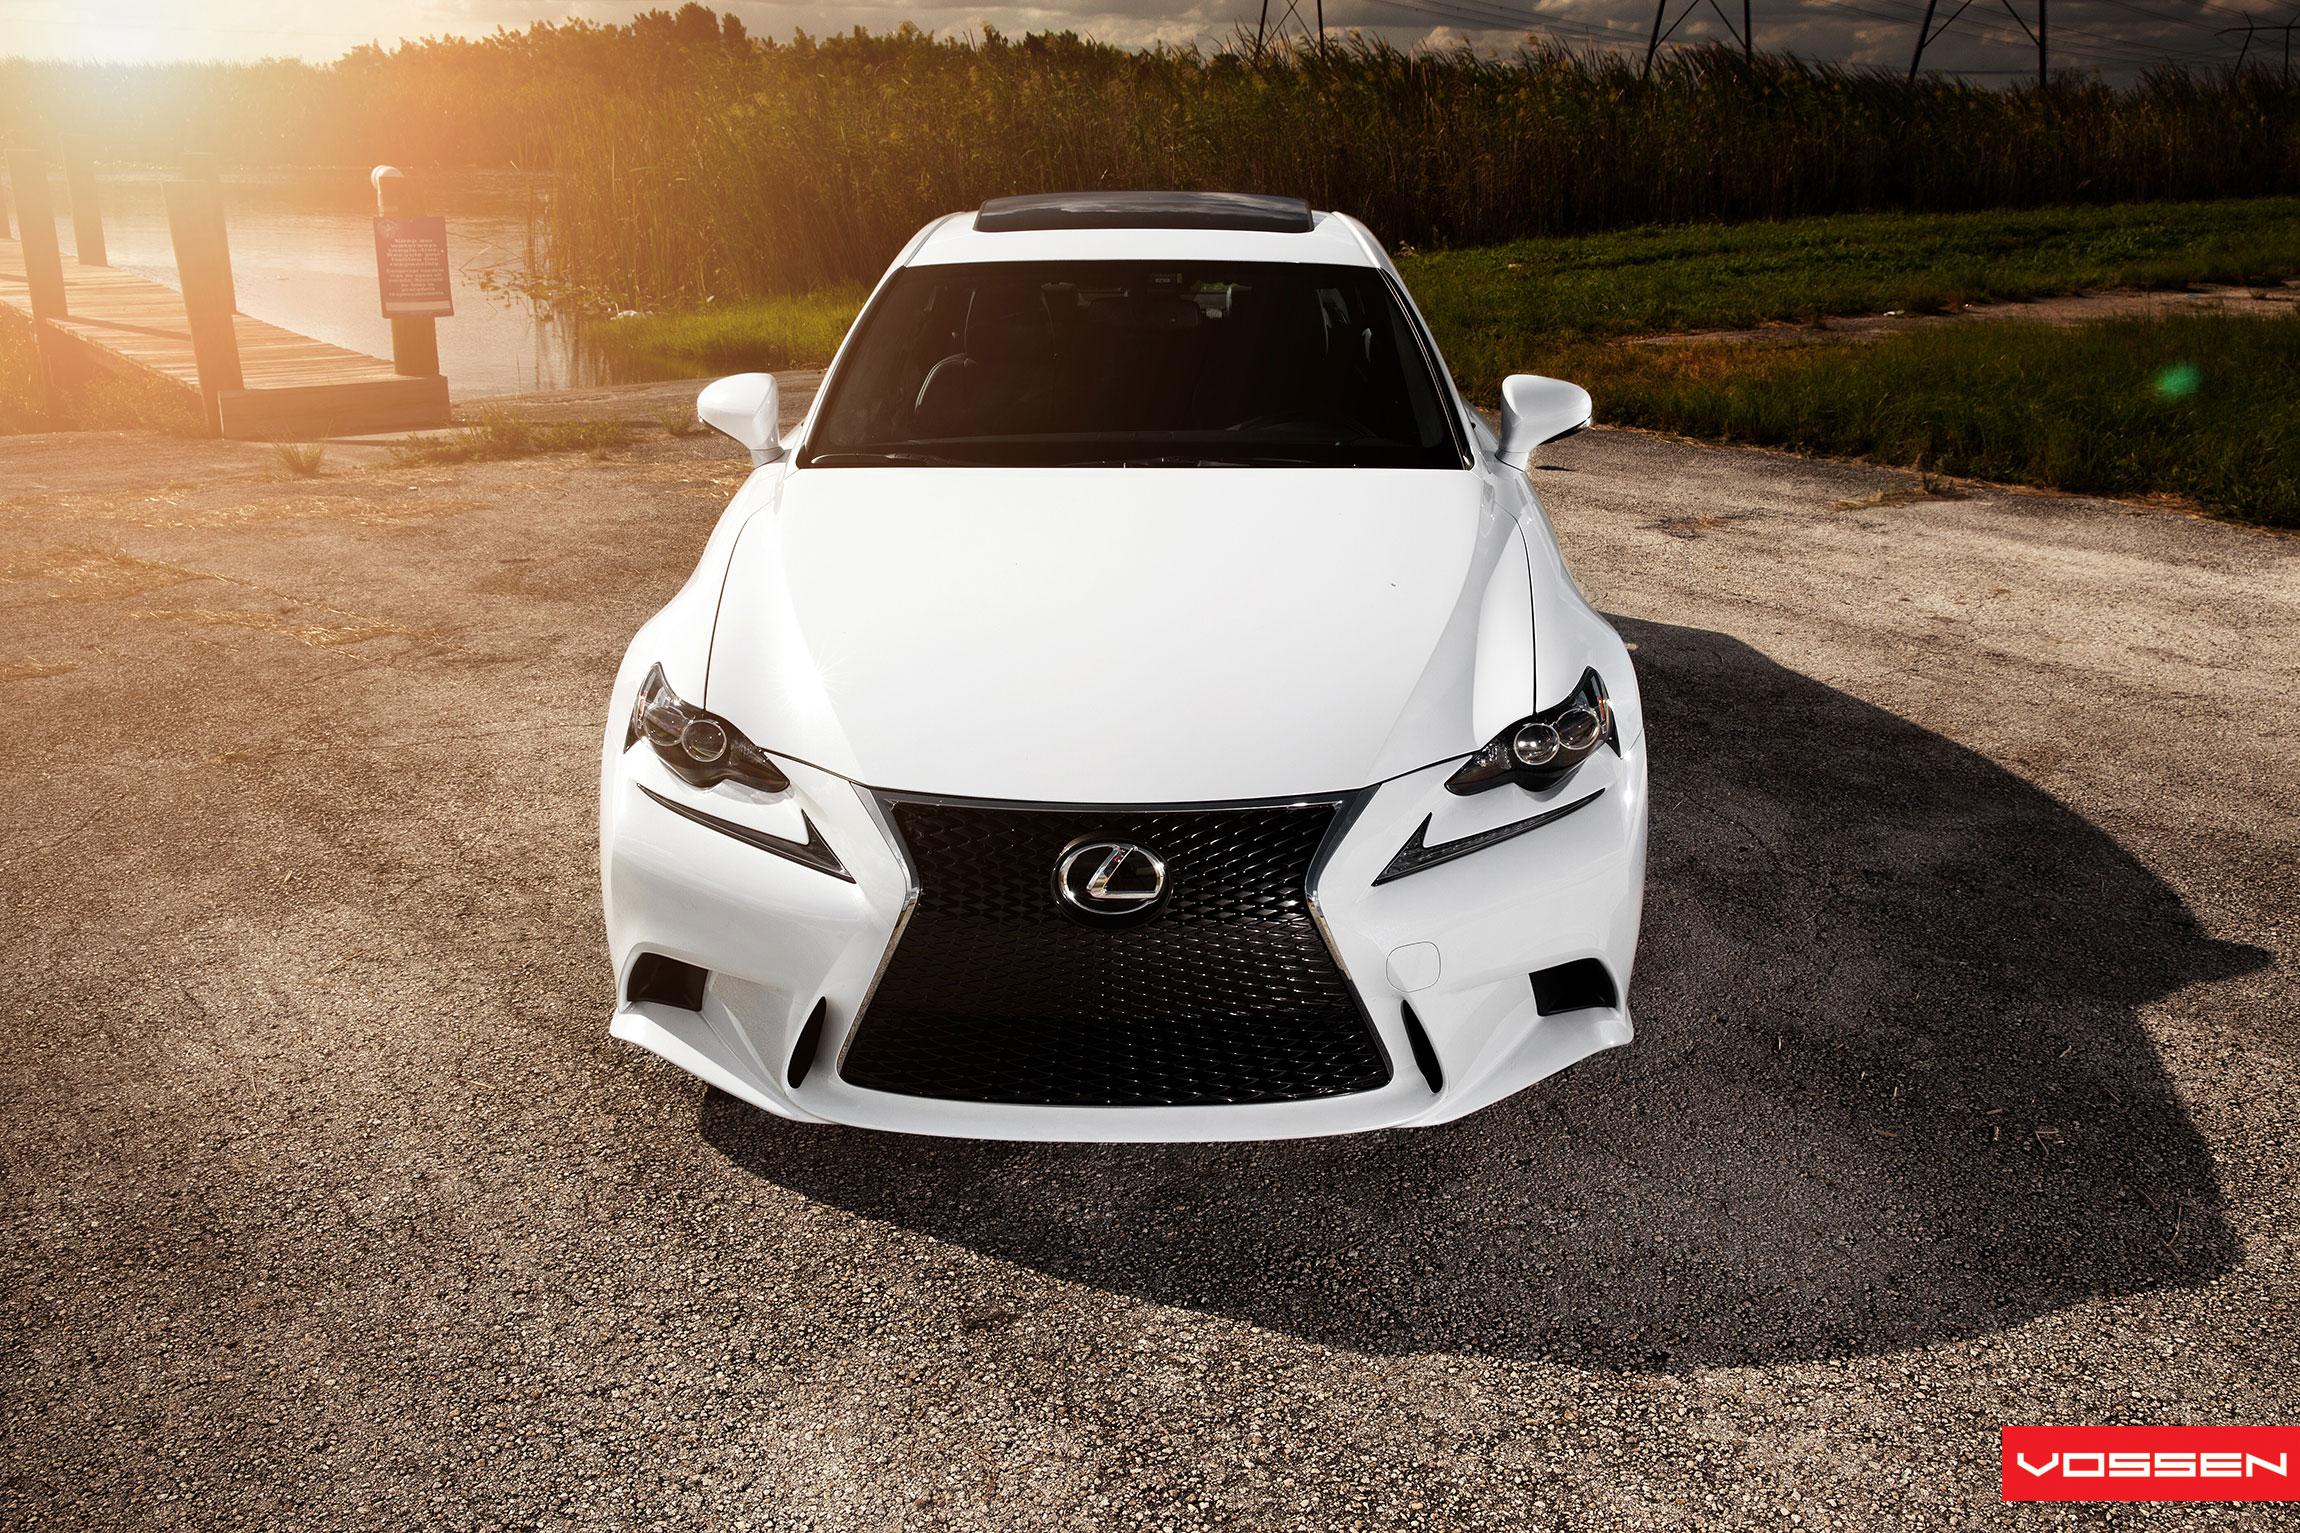 Gallery Lexus IS F SPORT on New Vossen CVT Directional